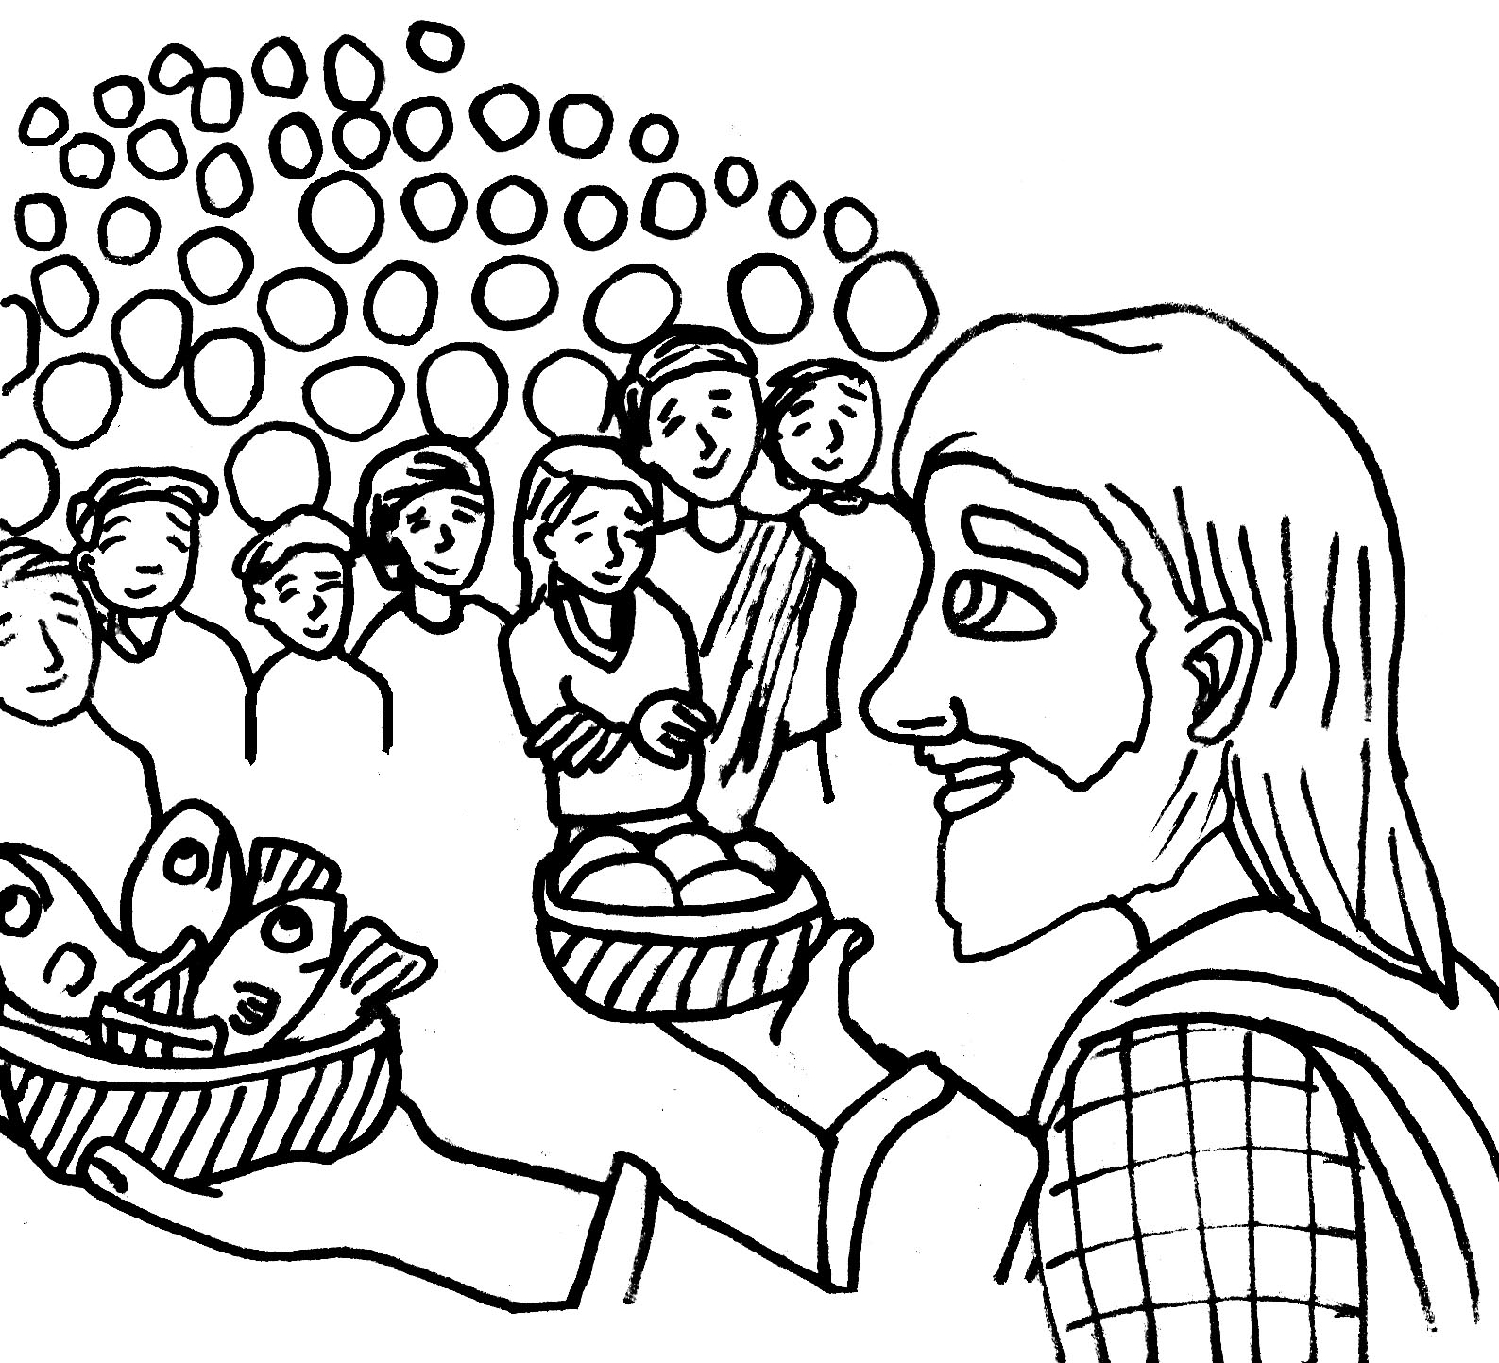 Jesus Feeds 5000 Coloring Page N3 free image